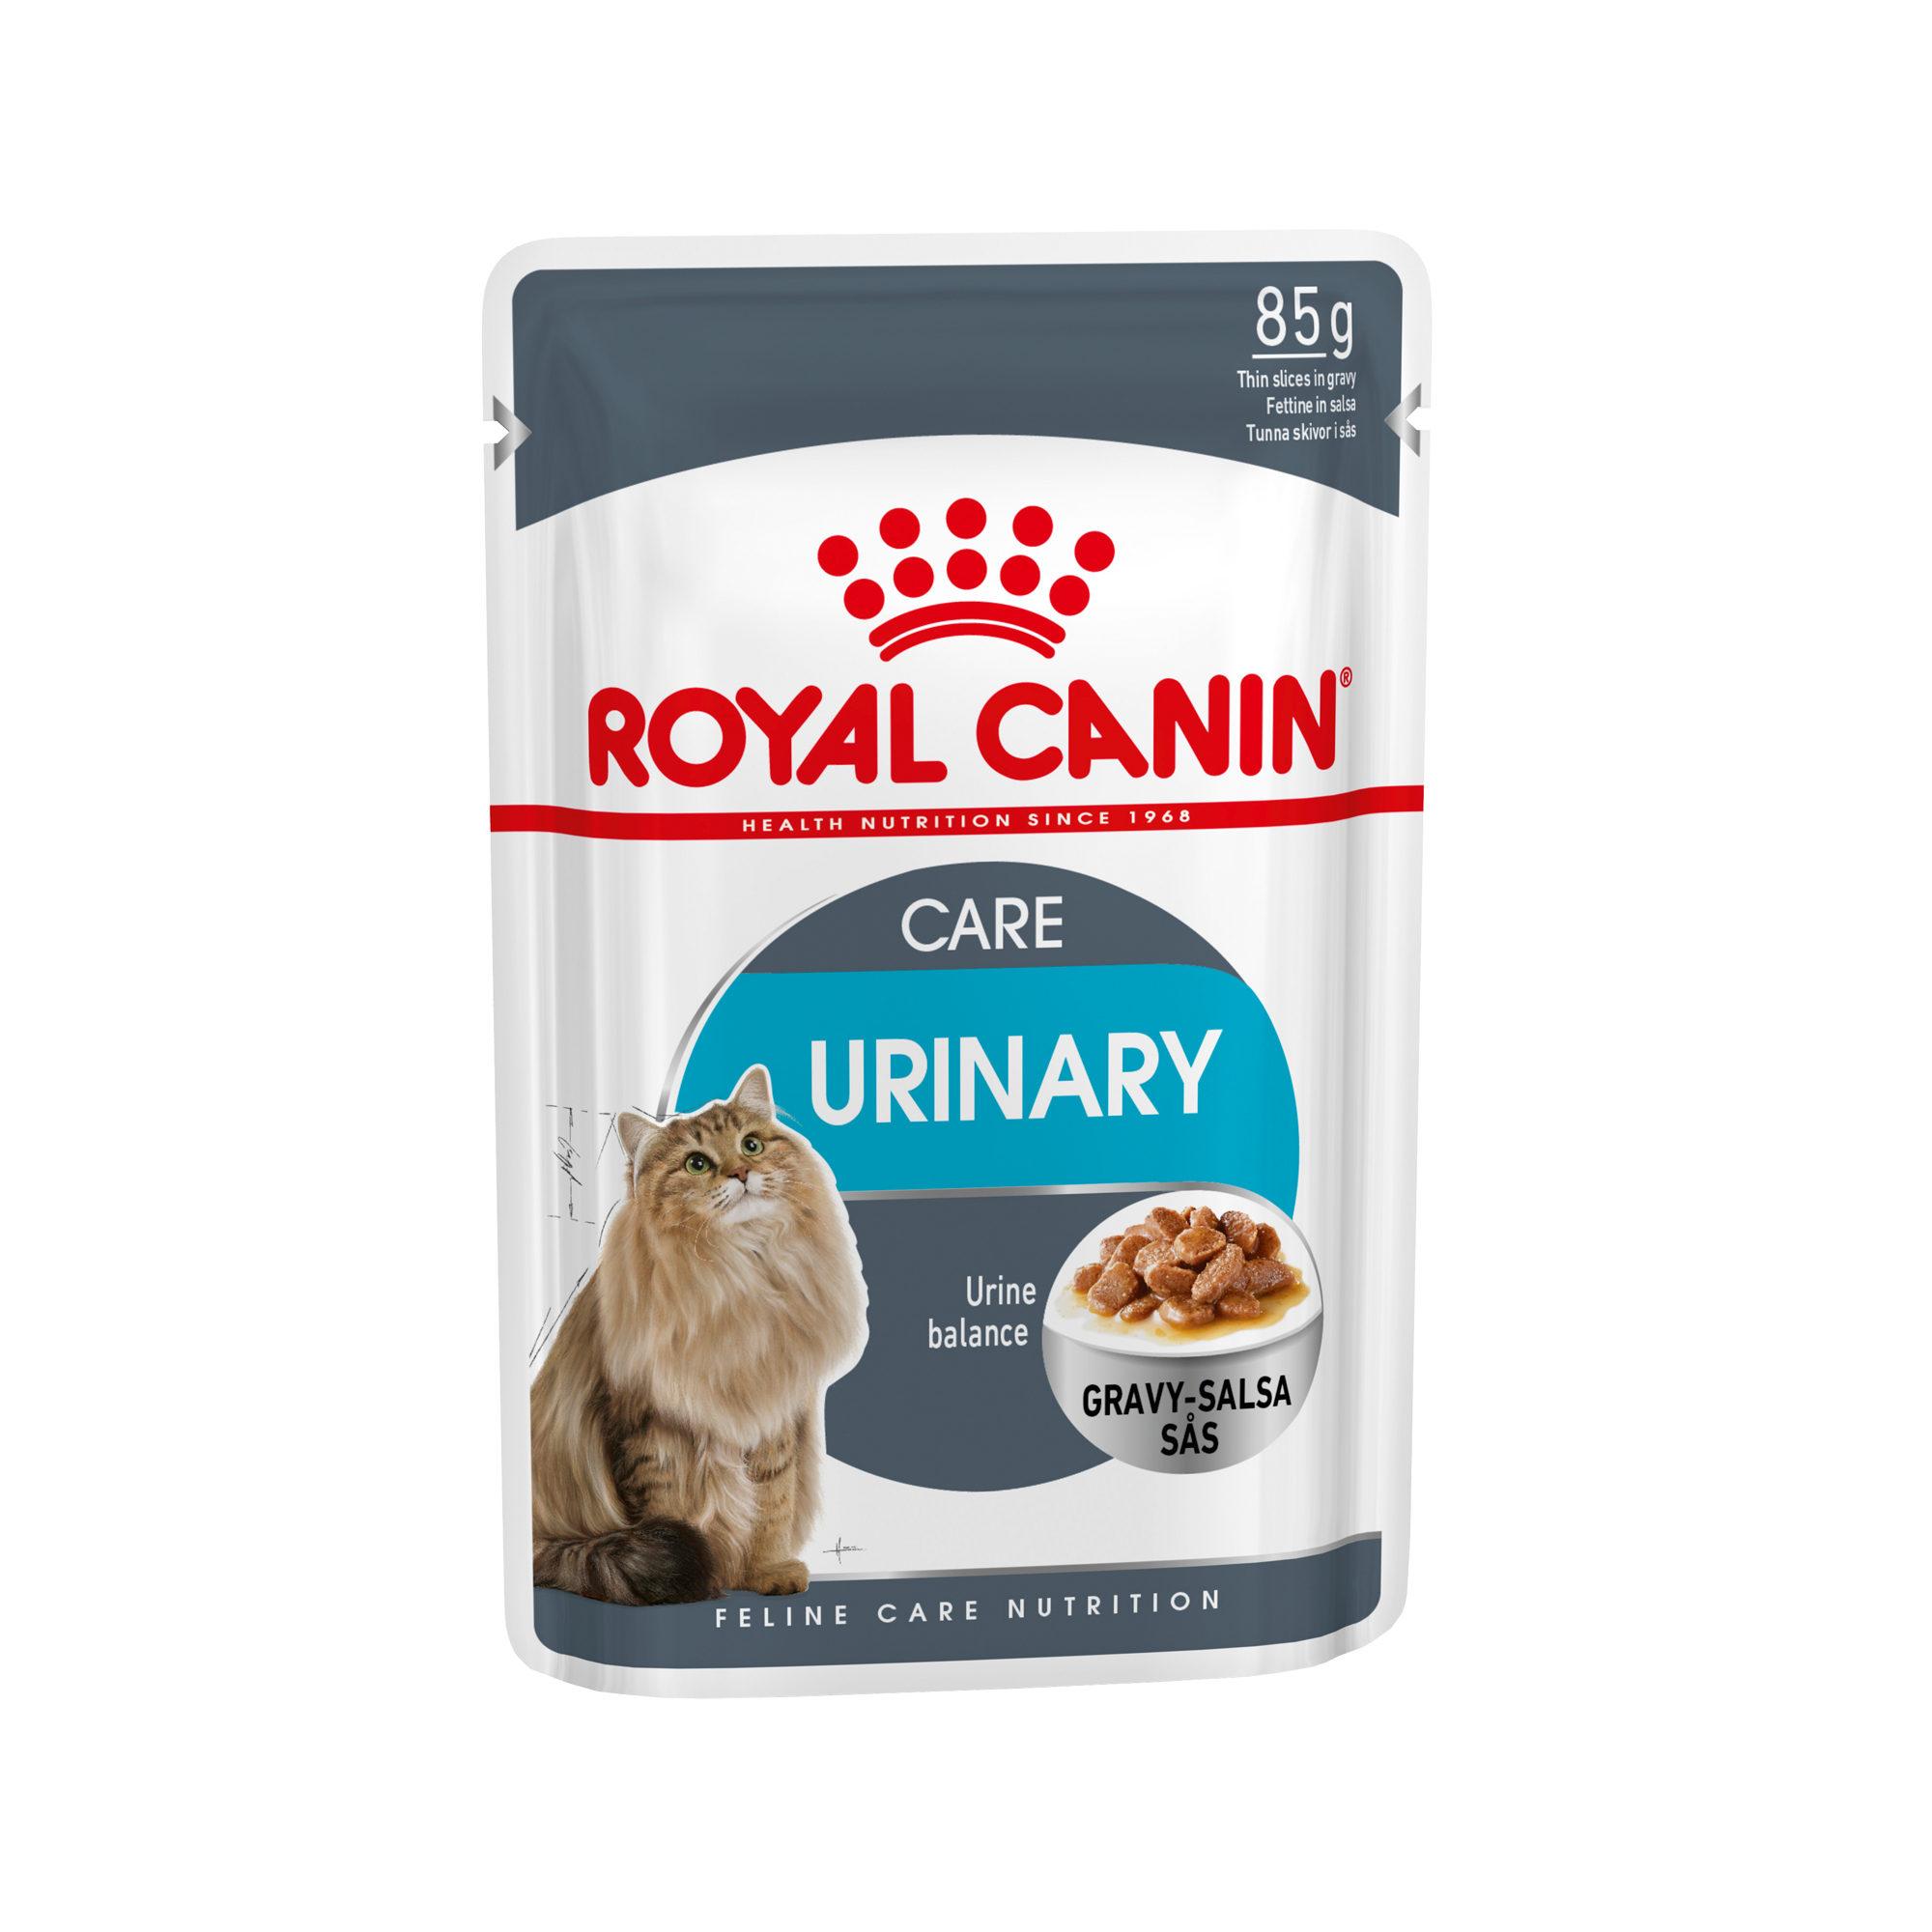 Royal Canin Urinary Care in Gravy Katzenfutter - Frischebeutel